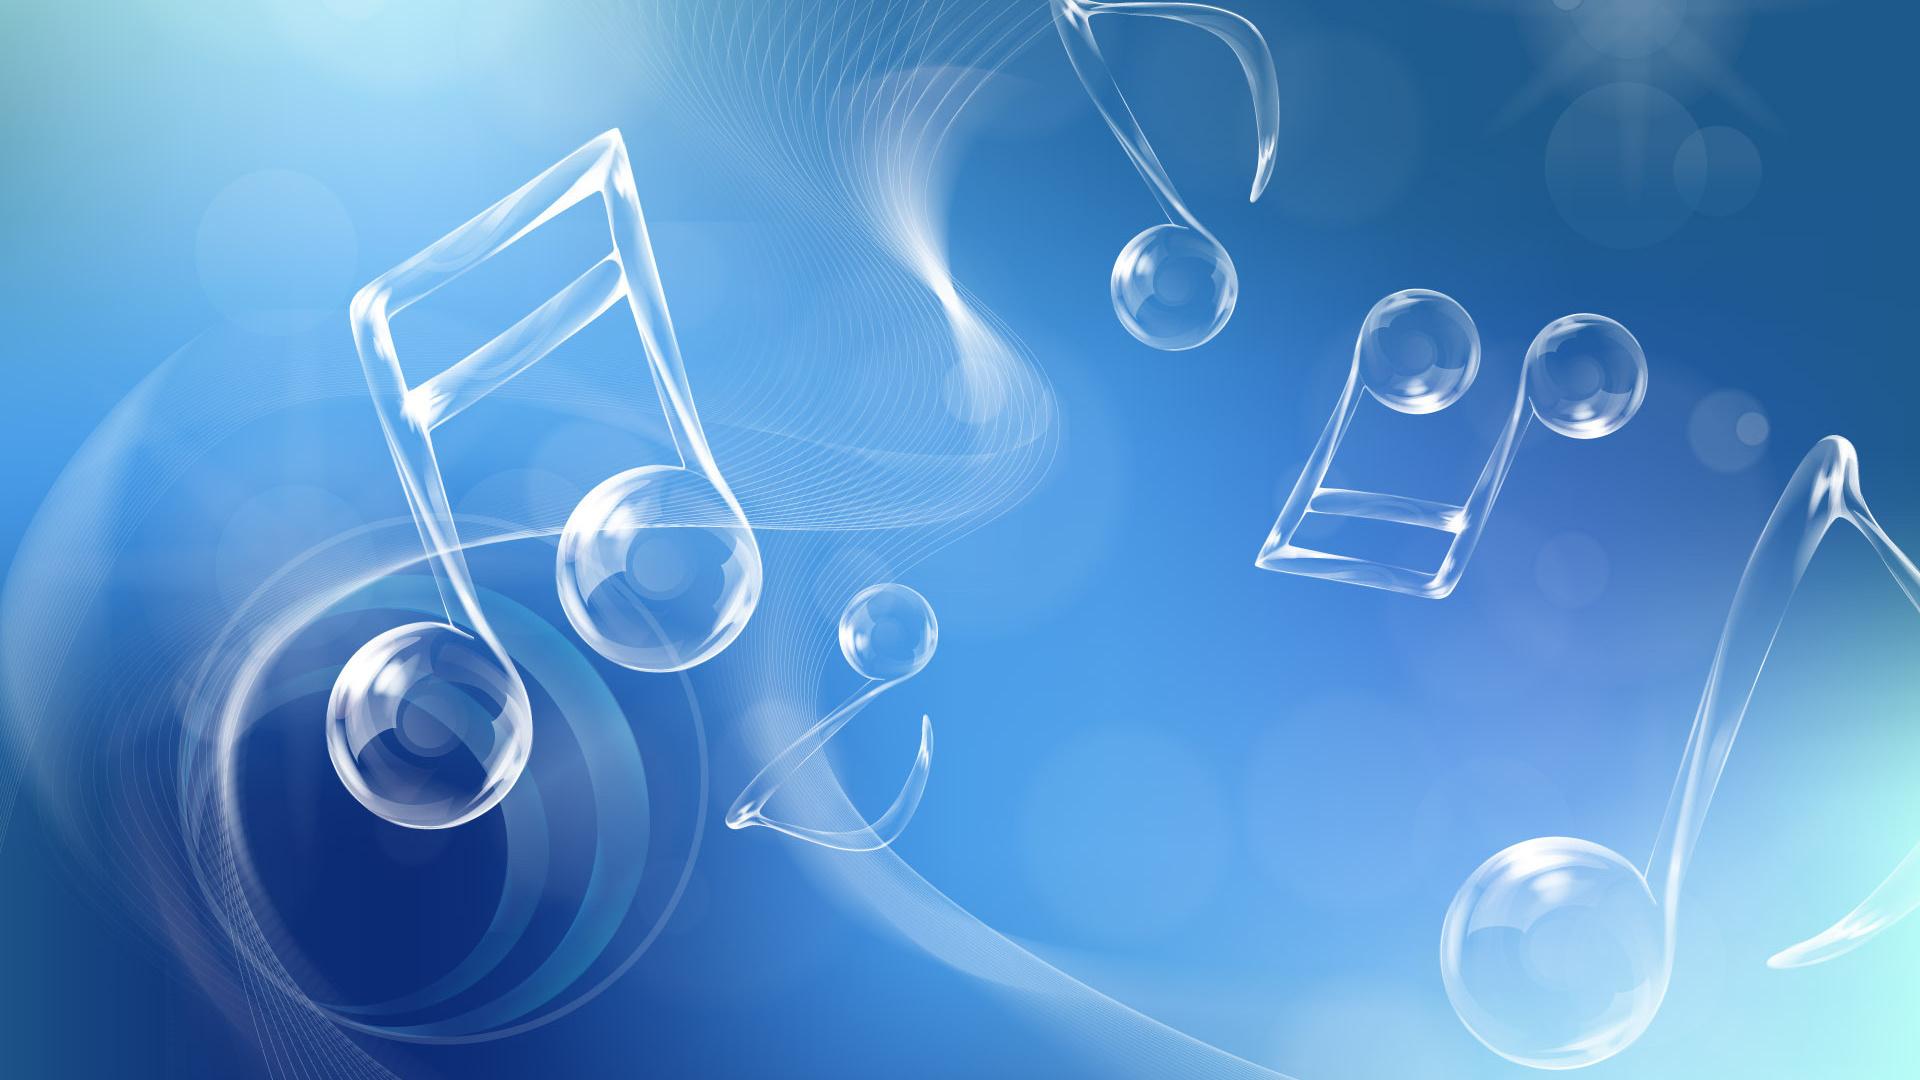 Картинка на презентацию музыкальная